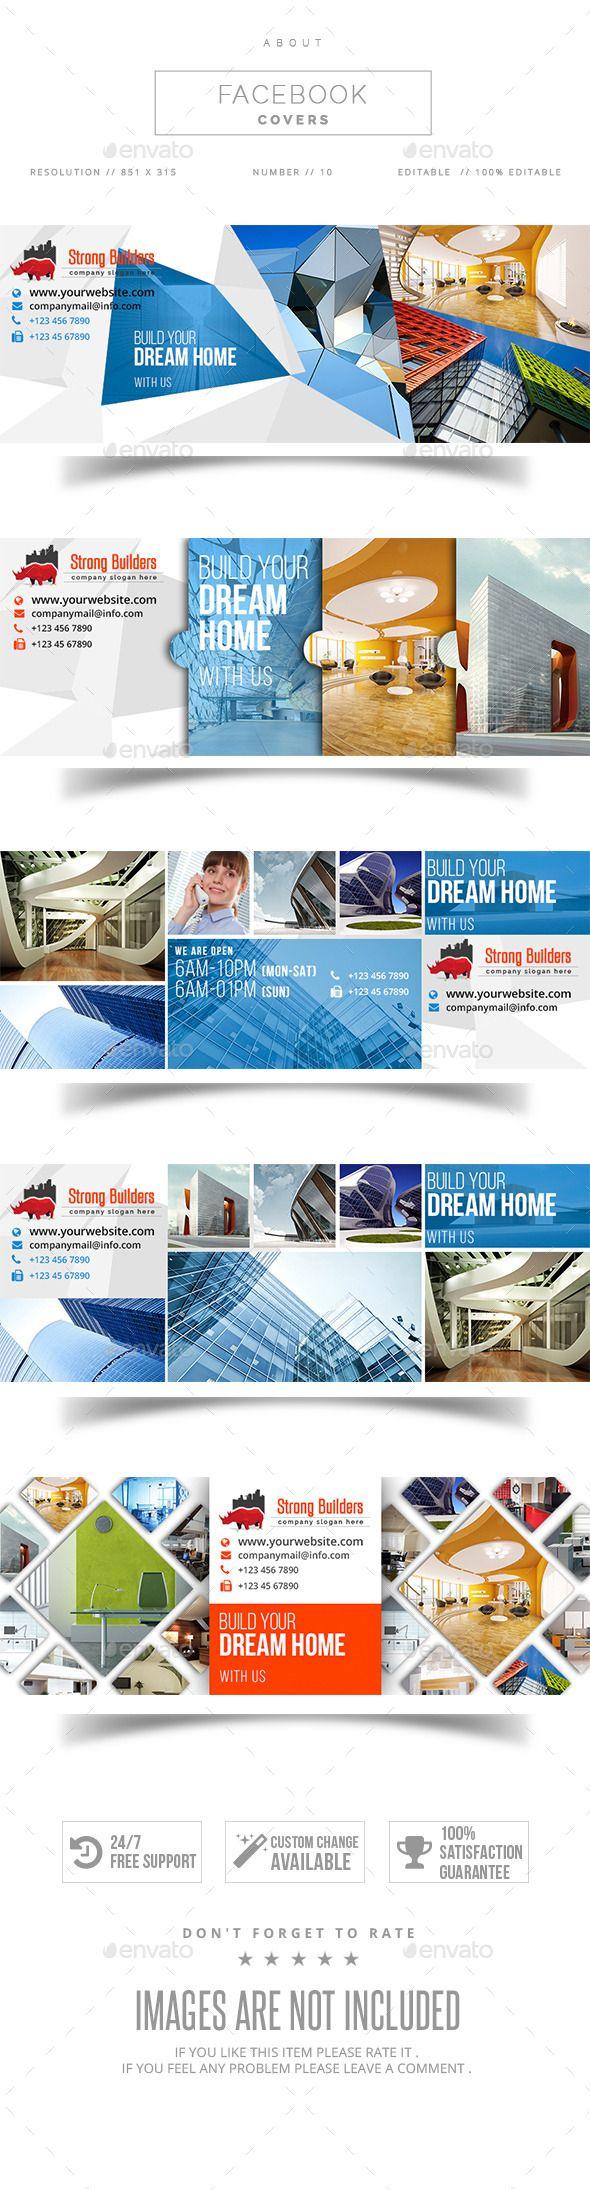 Real Estate Facebook Cover Template PSD #design Download: http://graphicriver.net/item/real-estate-facebook-cover/11300619?ref=ksioks